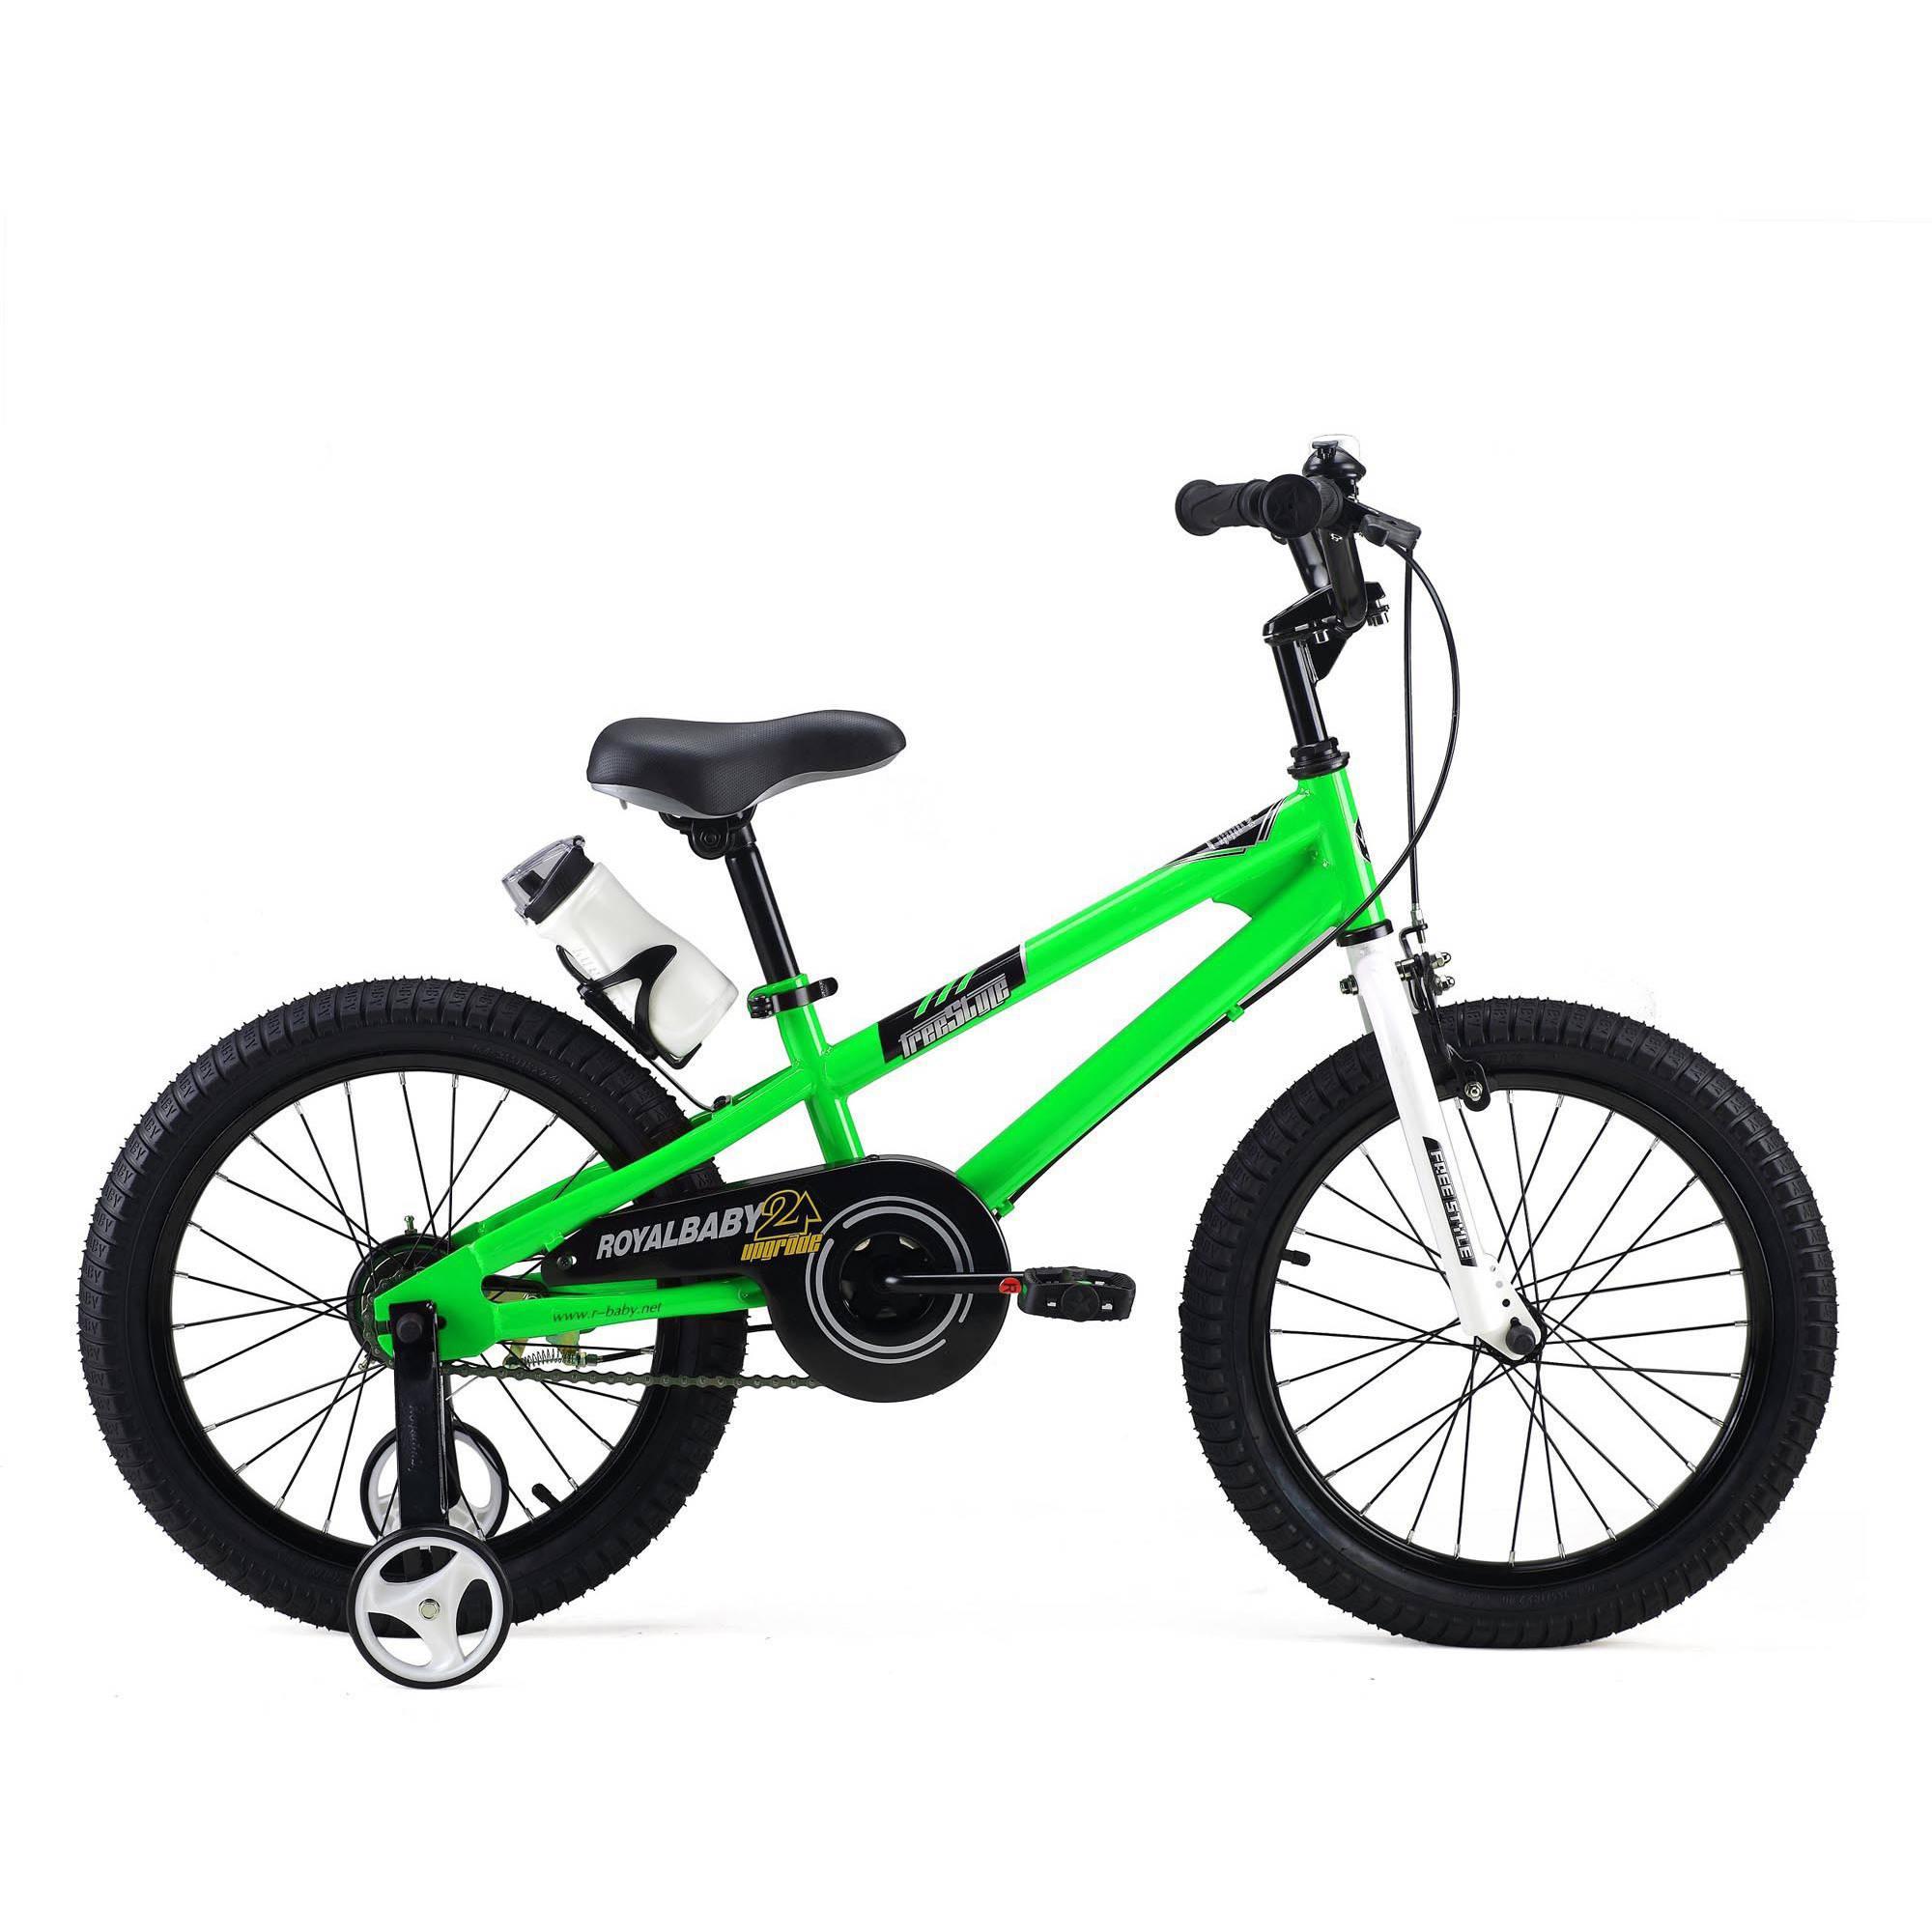 RoyalBaby BMX Freestyle Kids Bike, Boy's Bikes and Girl's Bikes with training